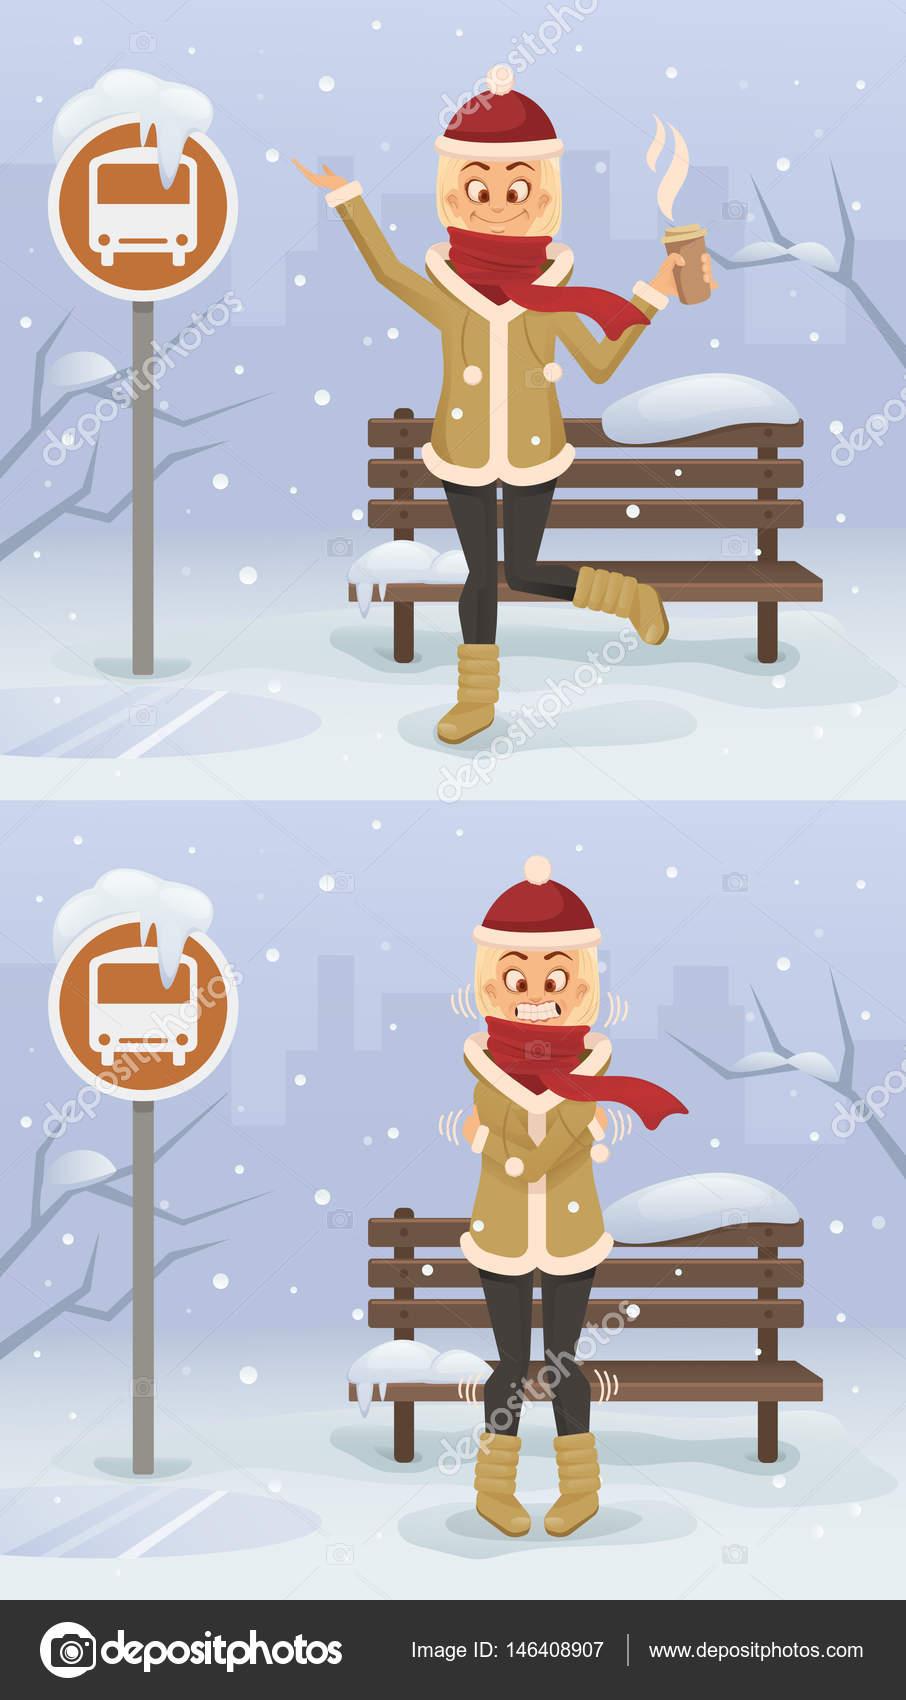 winter season cartoon pictures